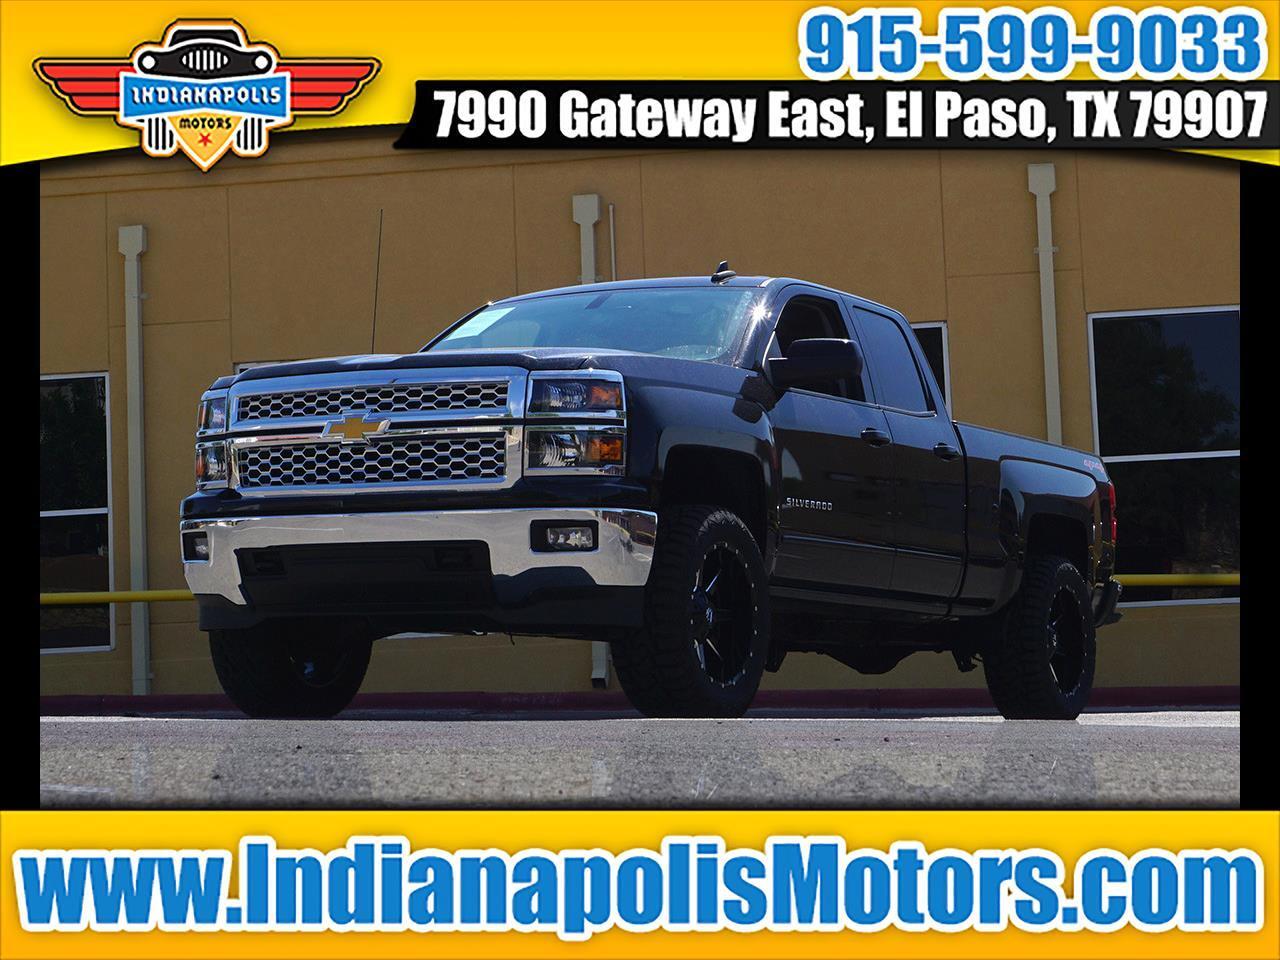 Used Cars El Paso TX | Used Cars & Trucks TX | Indianapolis